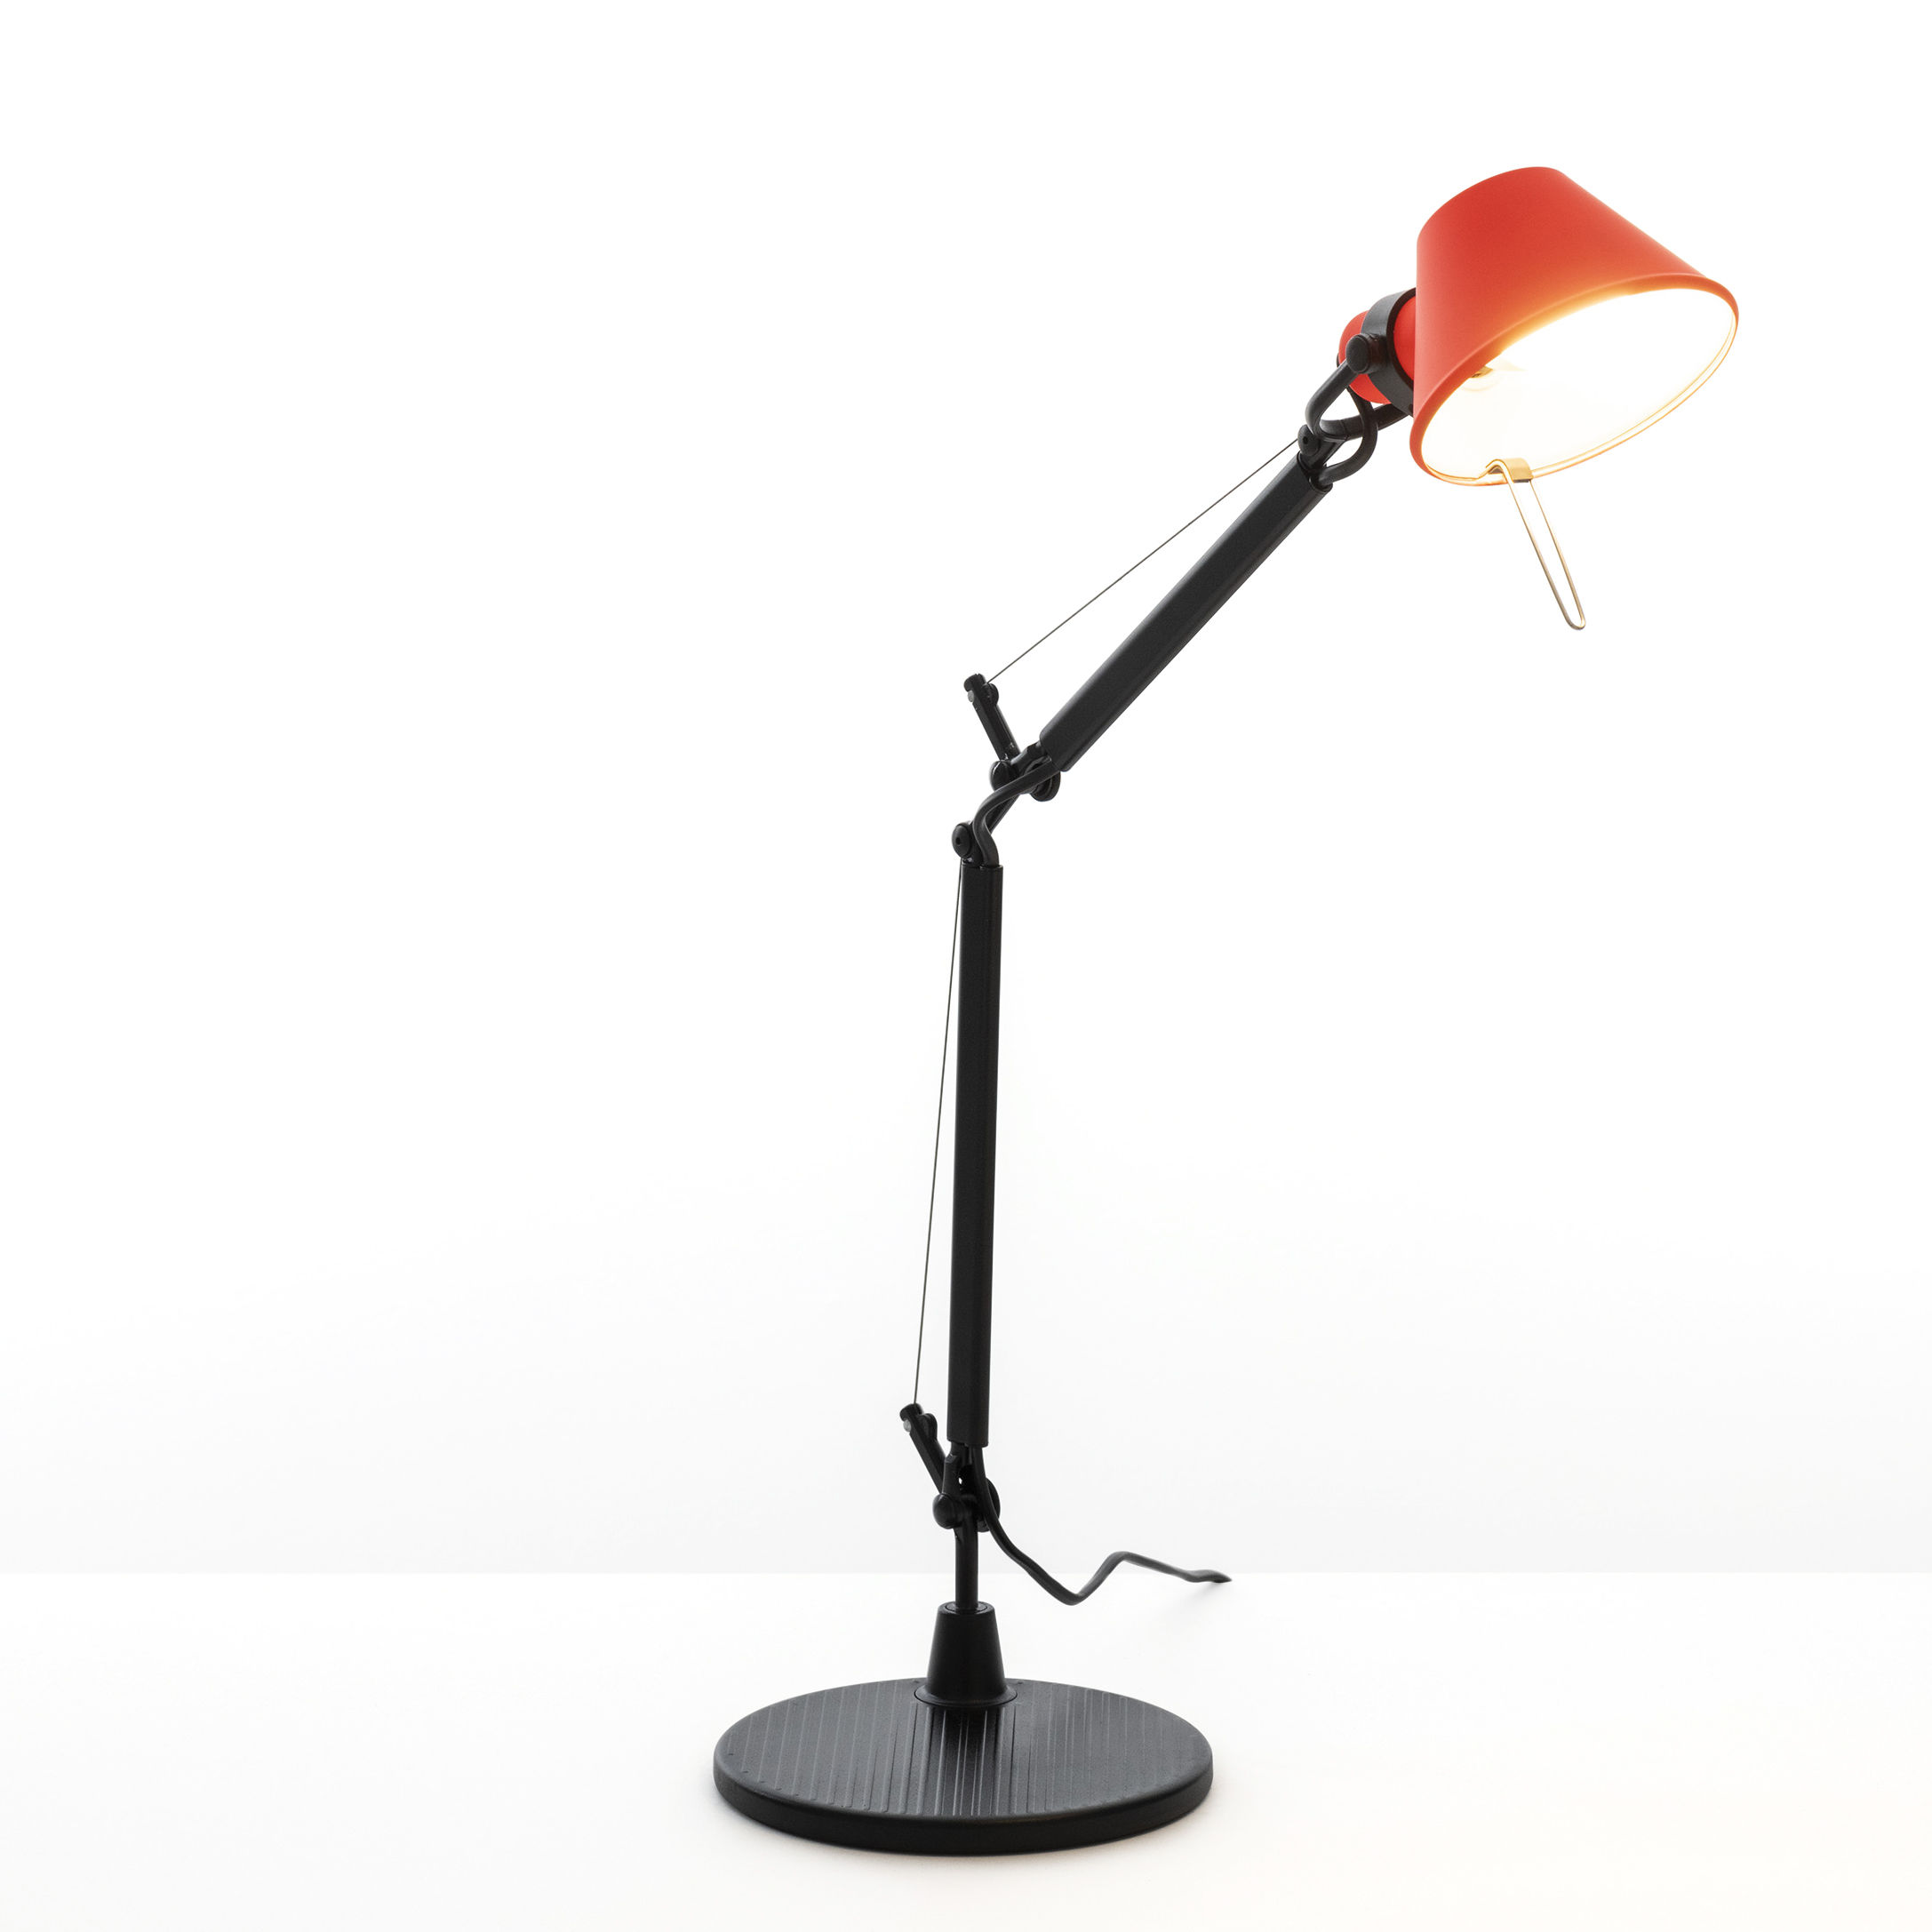 Lighting - Table Lamps - Tolomeo Micro Bicolor Table lamp by Artemide - Coral / Black - Aluminium, Steel